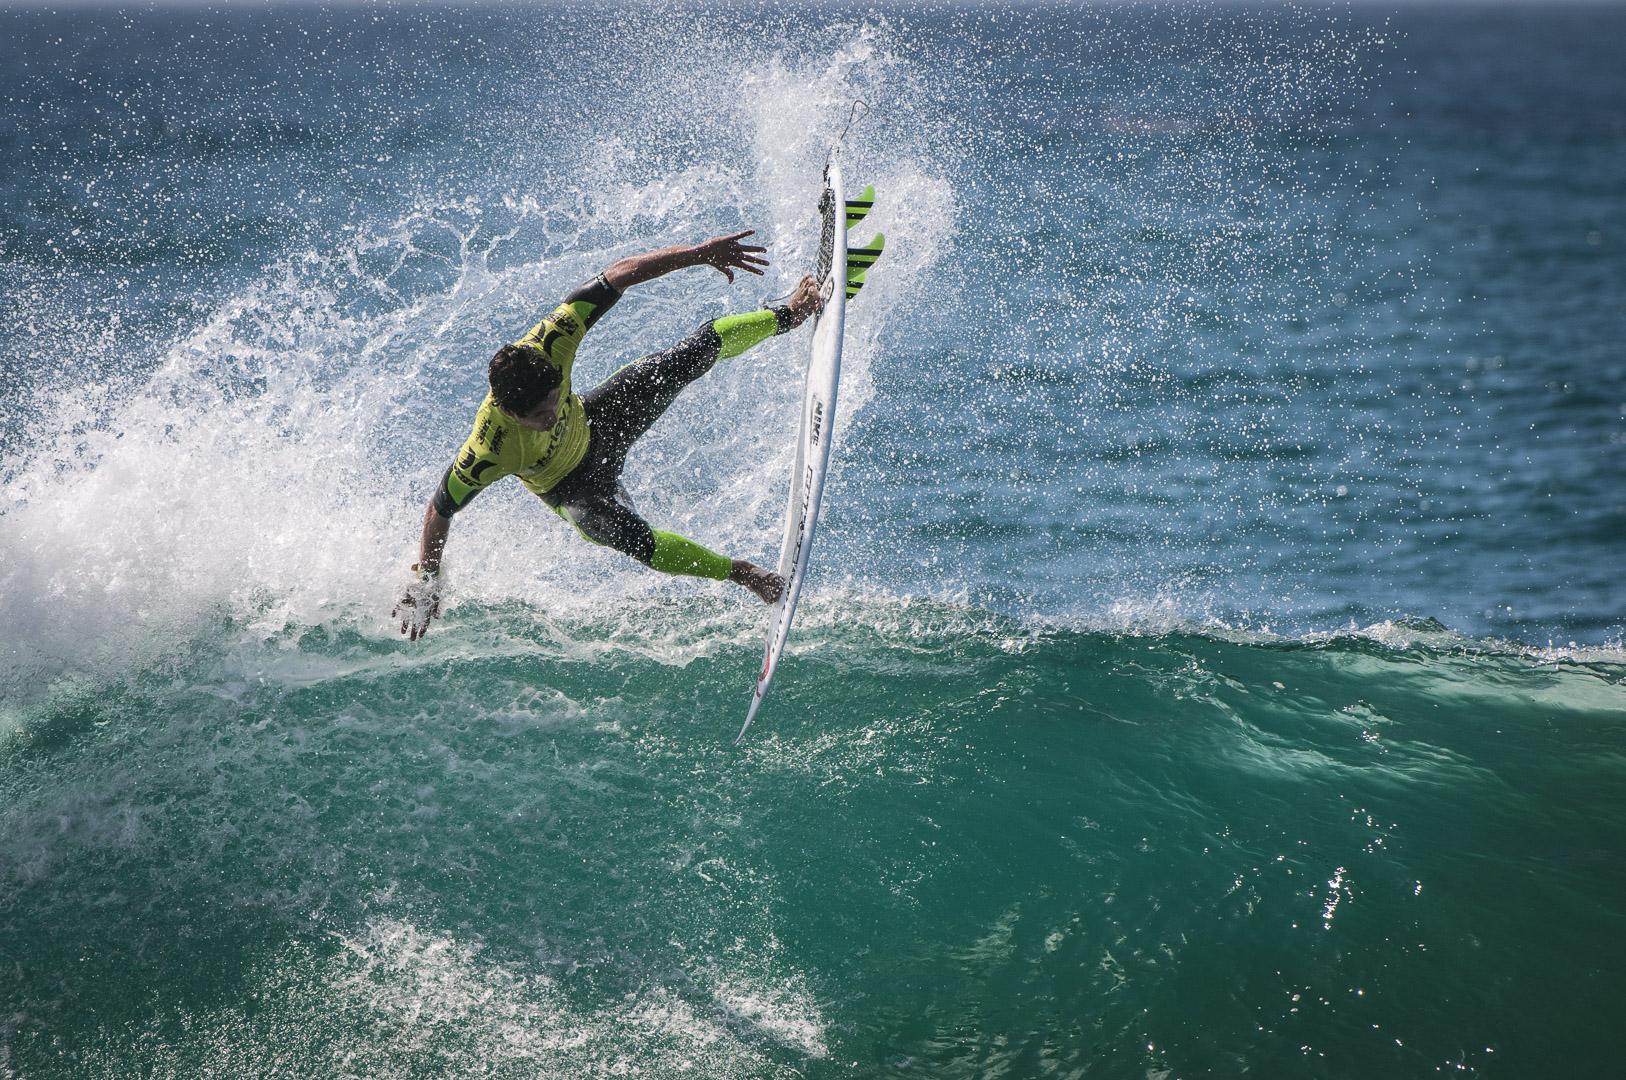 Jonathan Fennell - Surfer